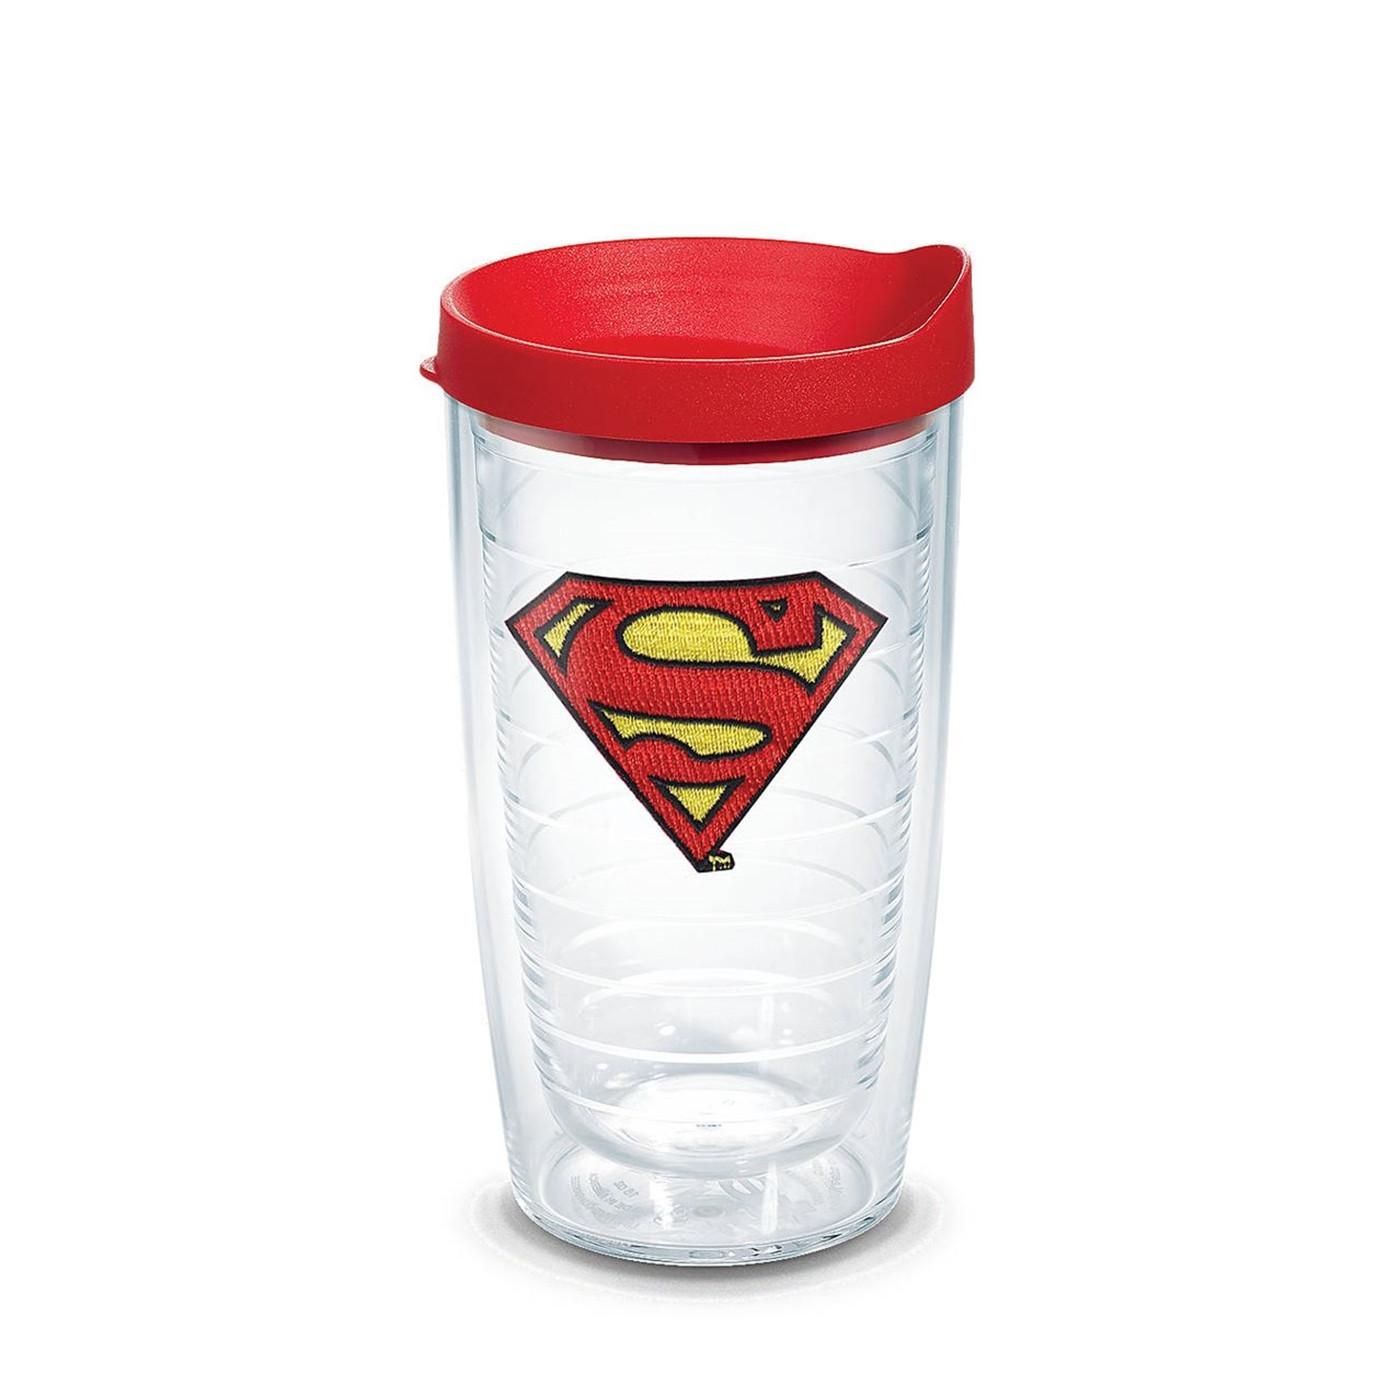 Superman Emblem Tumbler with Lid 16 oz Tervis®